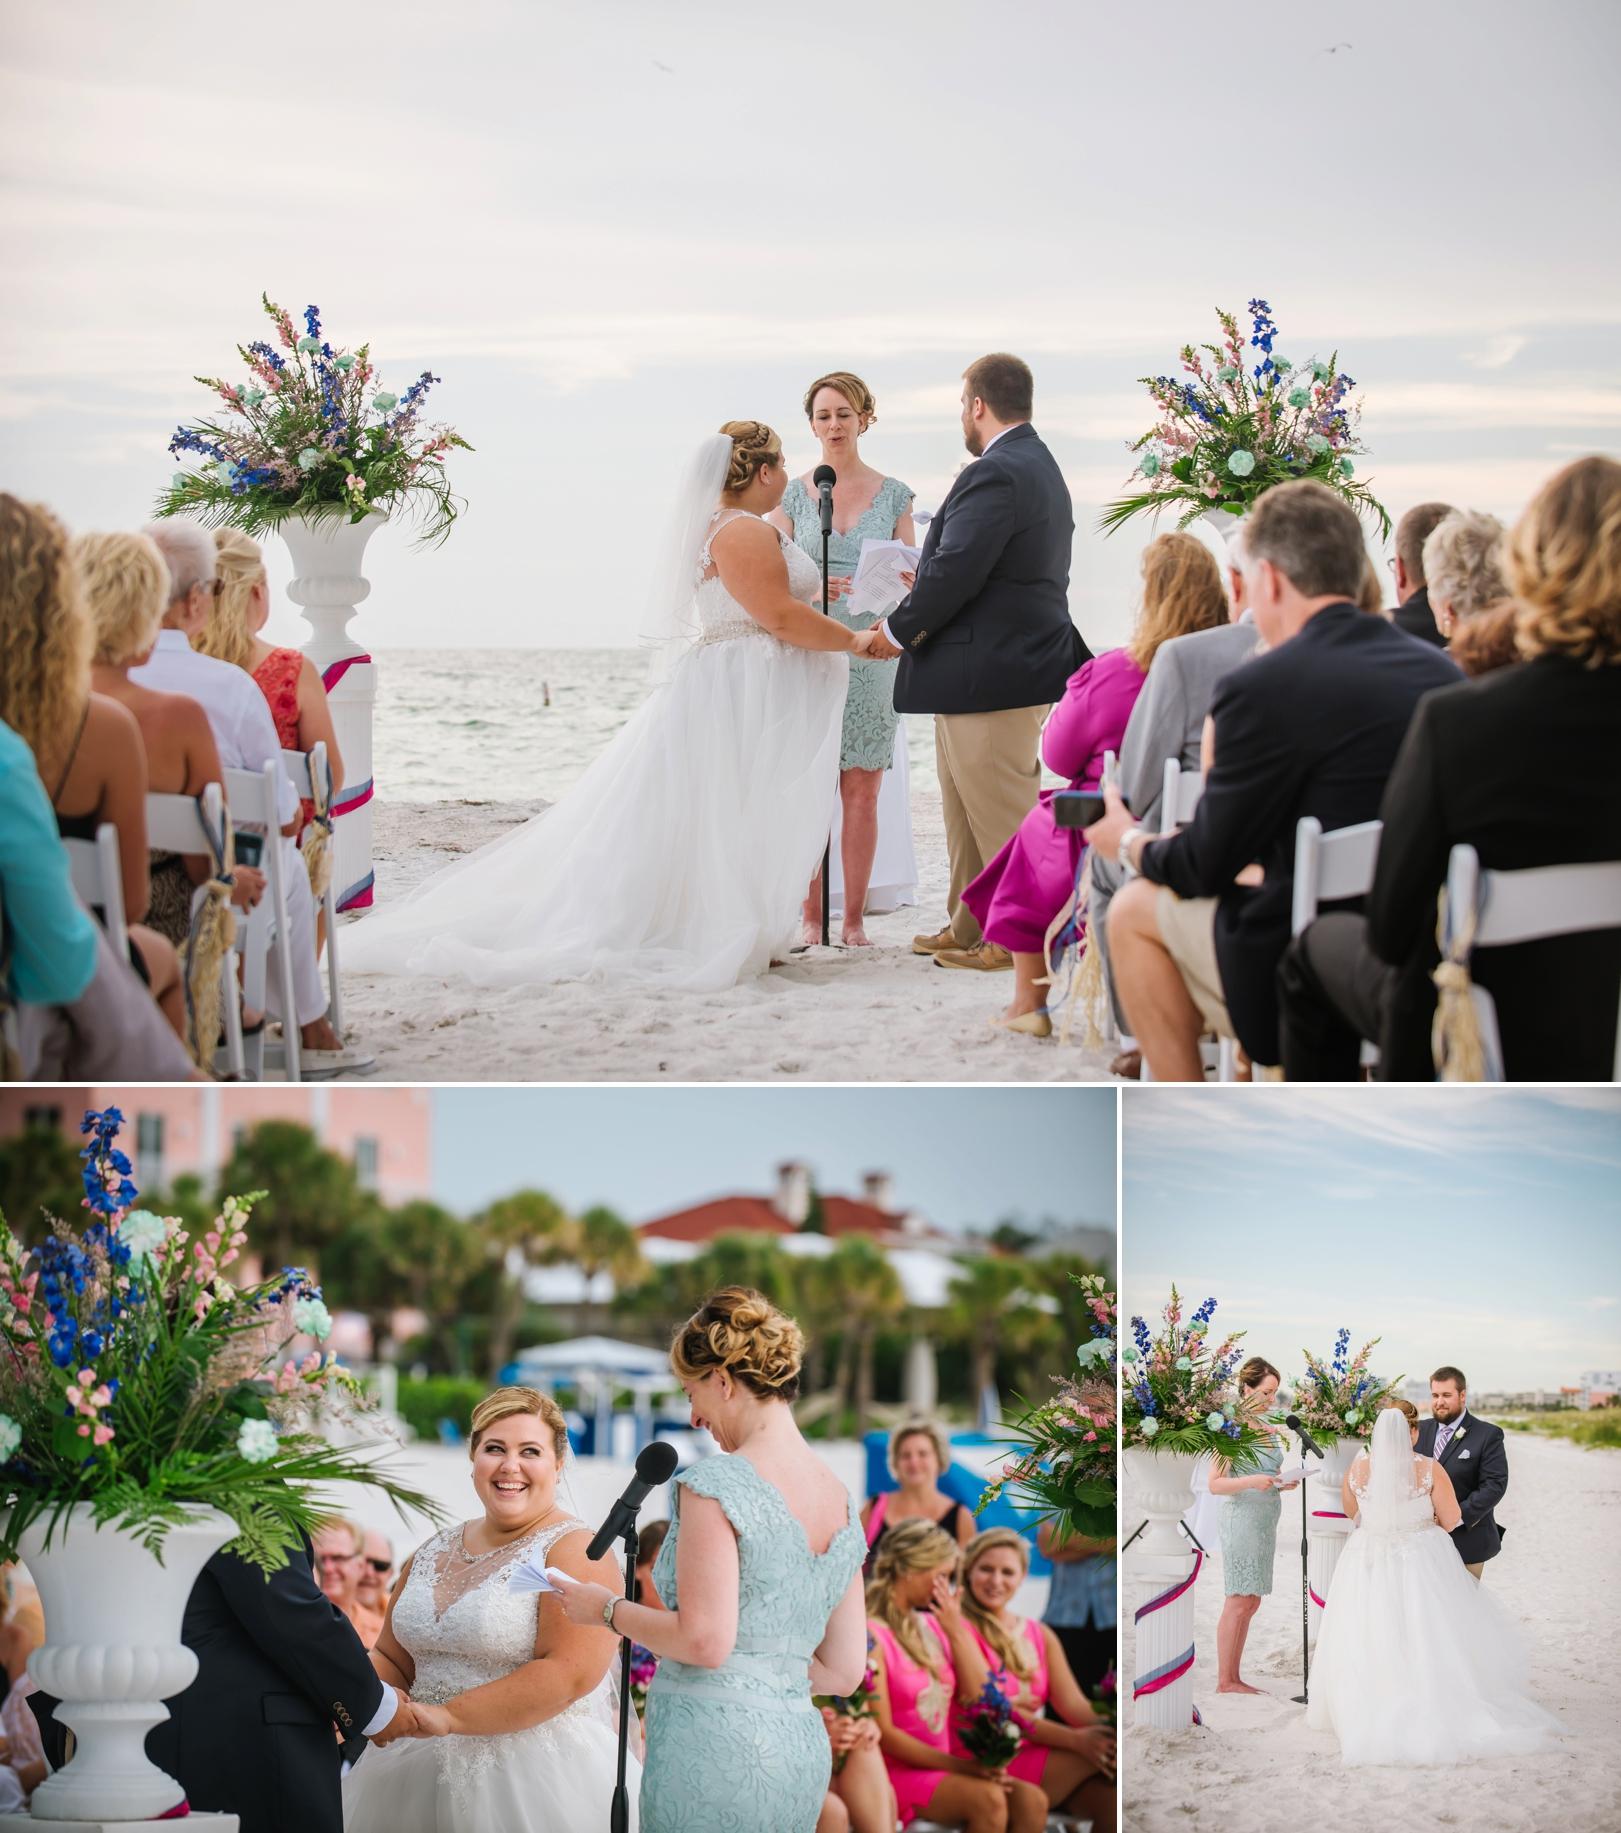 St-pete-wedding-photographer-don-caesar-ashlee-hamon_0016.jpg